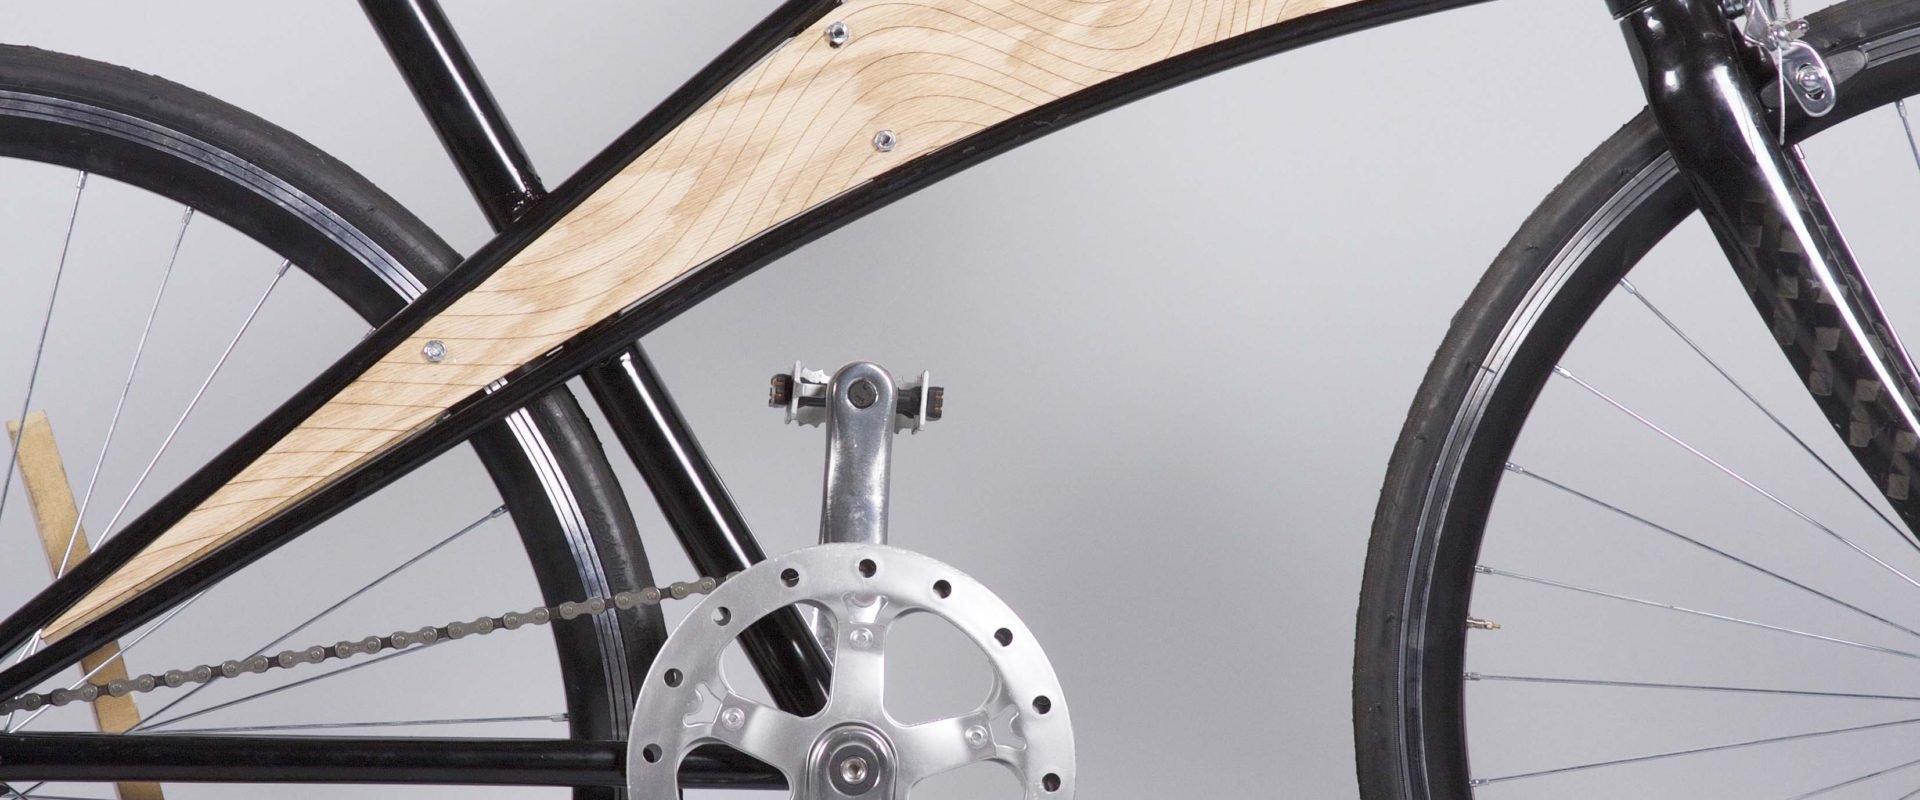 Permalink to: Bicicleta